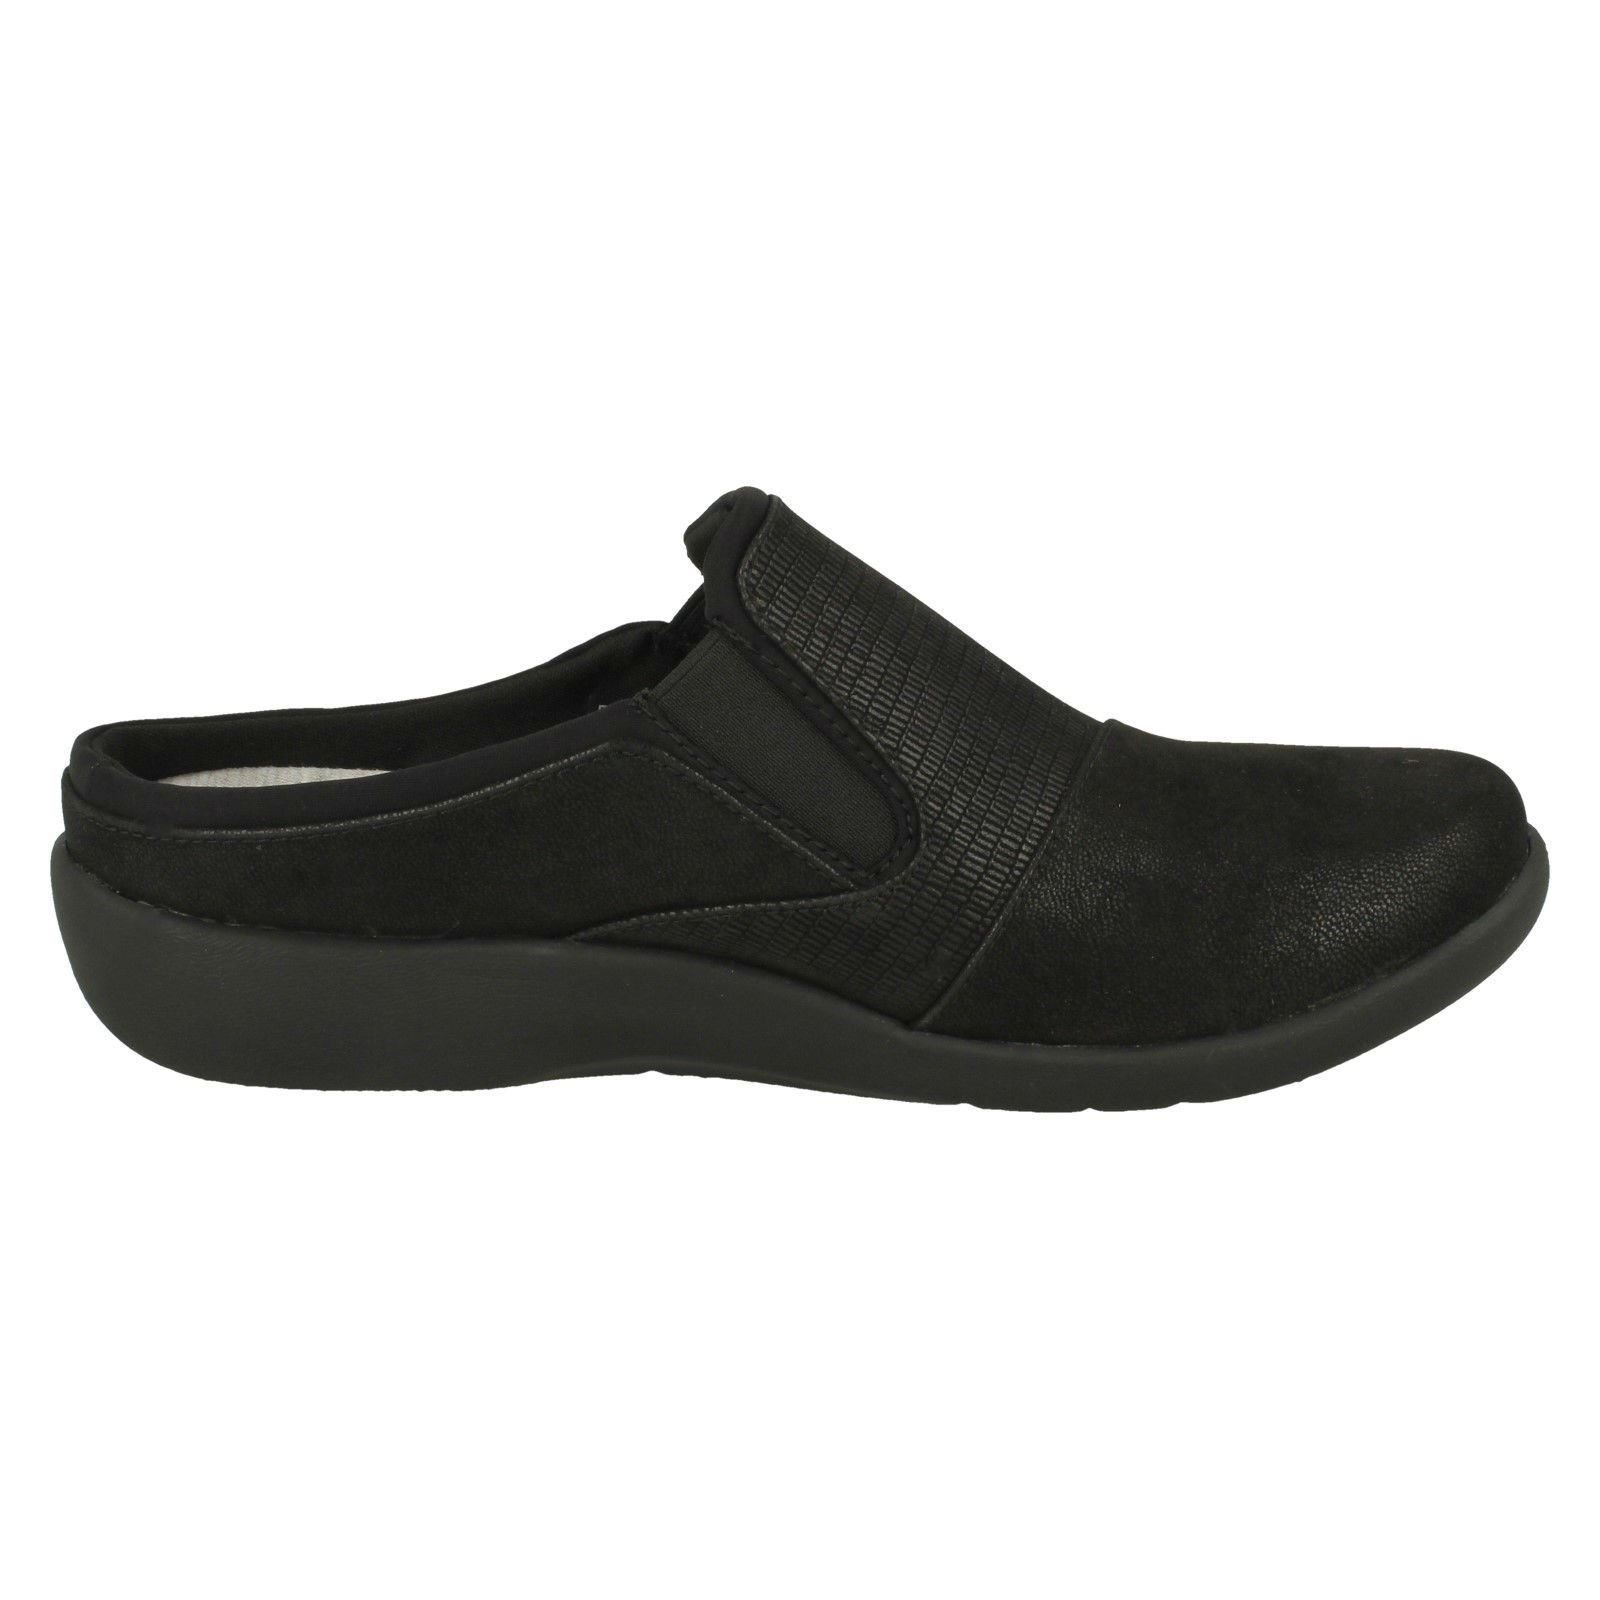 Ladies Clarks Cloud Steppers Slip On Mule Shoes /'Sillian Free/'